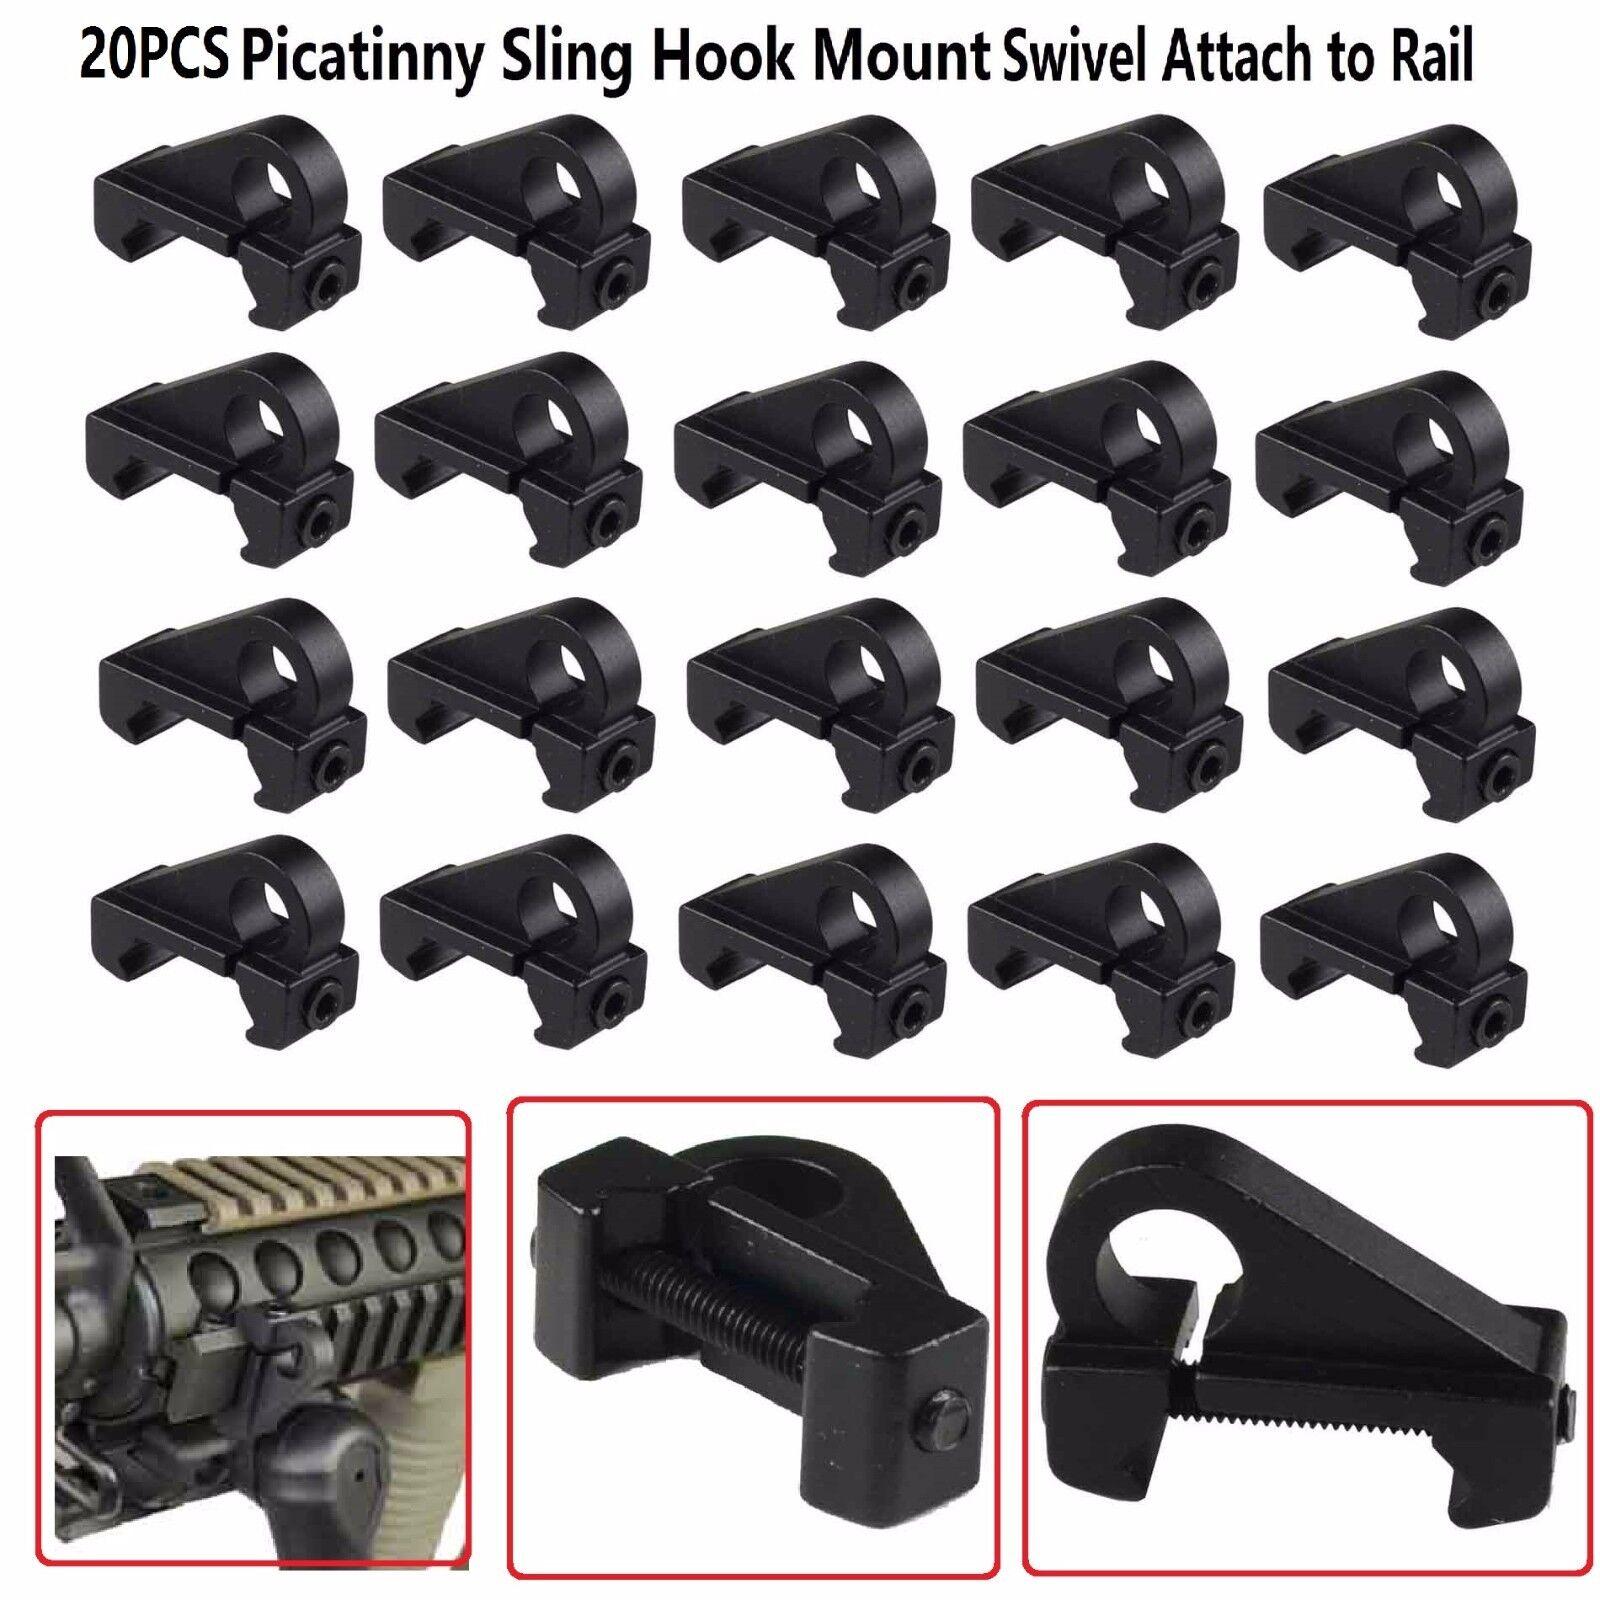 20 PCS Set Aluminum Tactical Picatinny Sling Hook Mount Swivel Attach to Rail